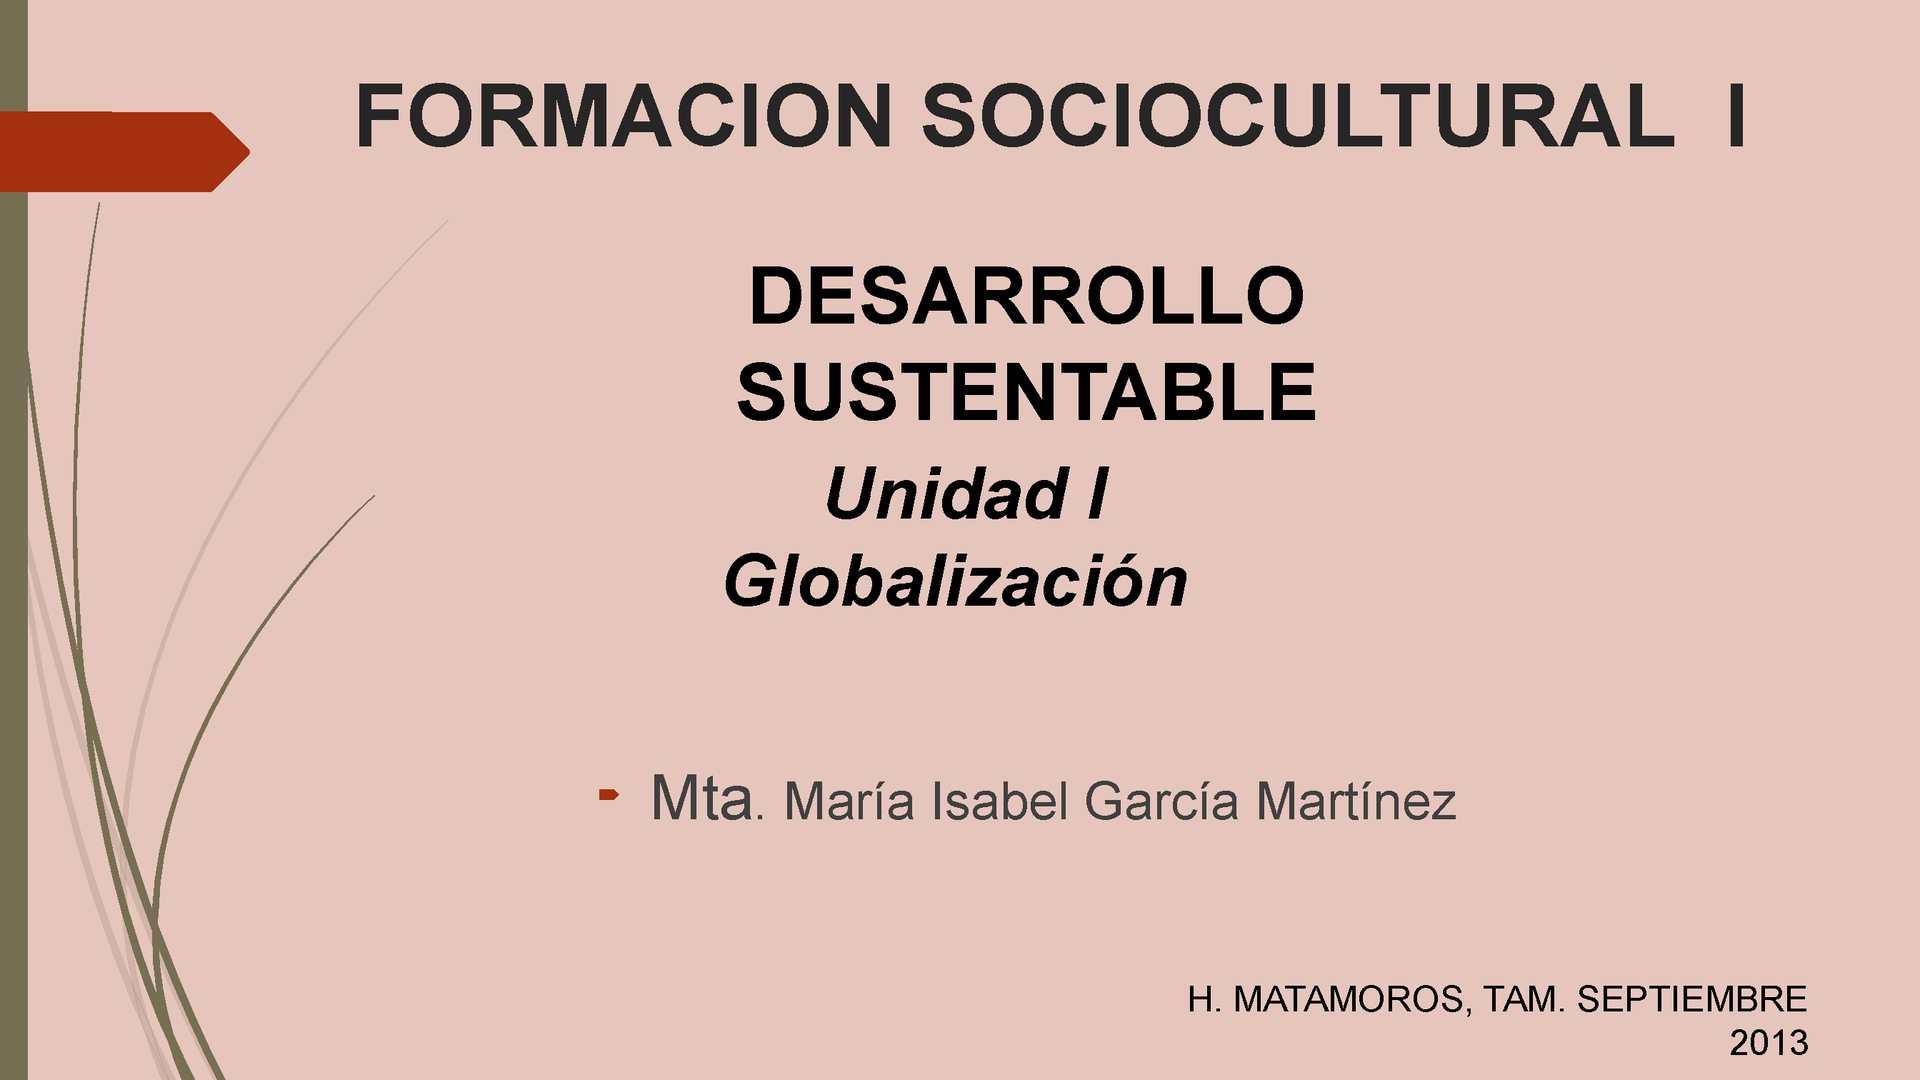 Formacion Sociocultural 1